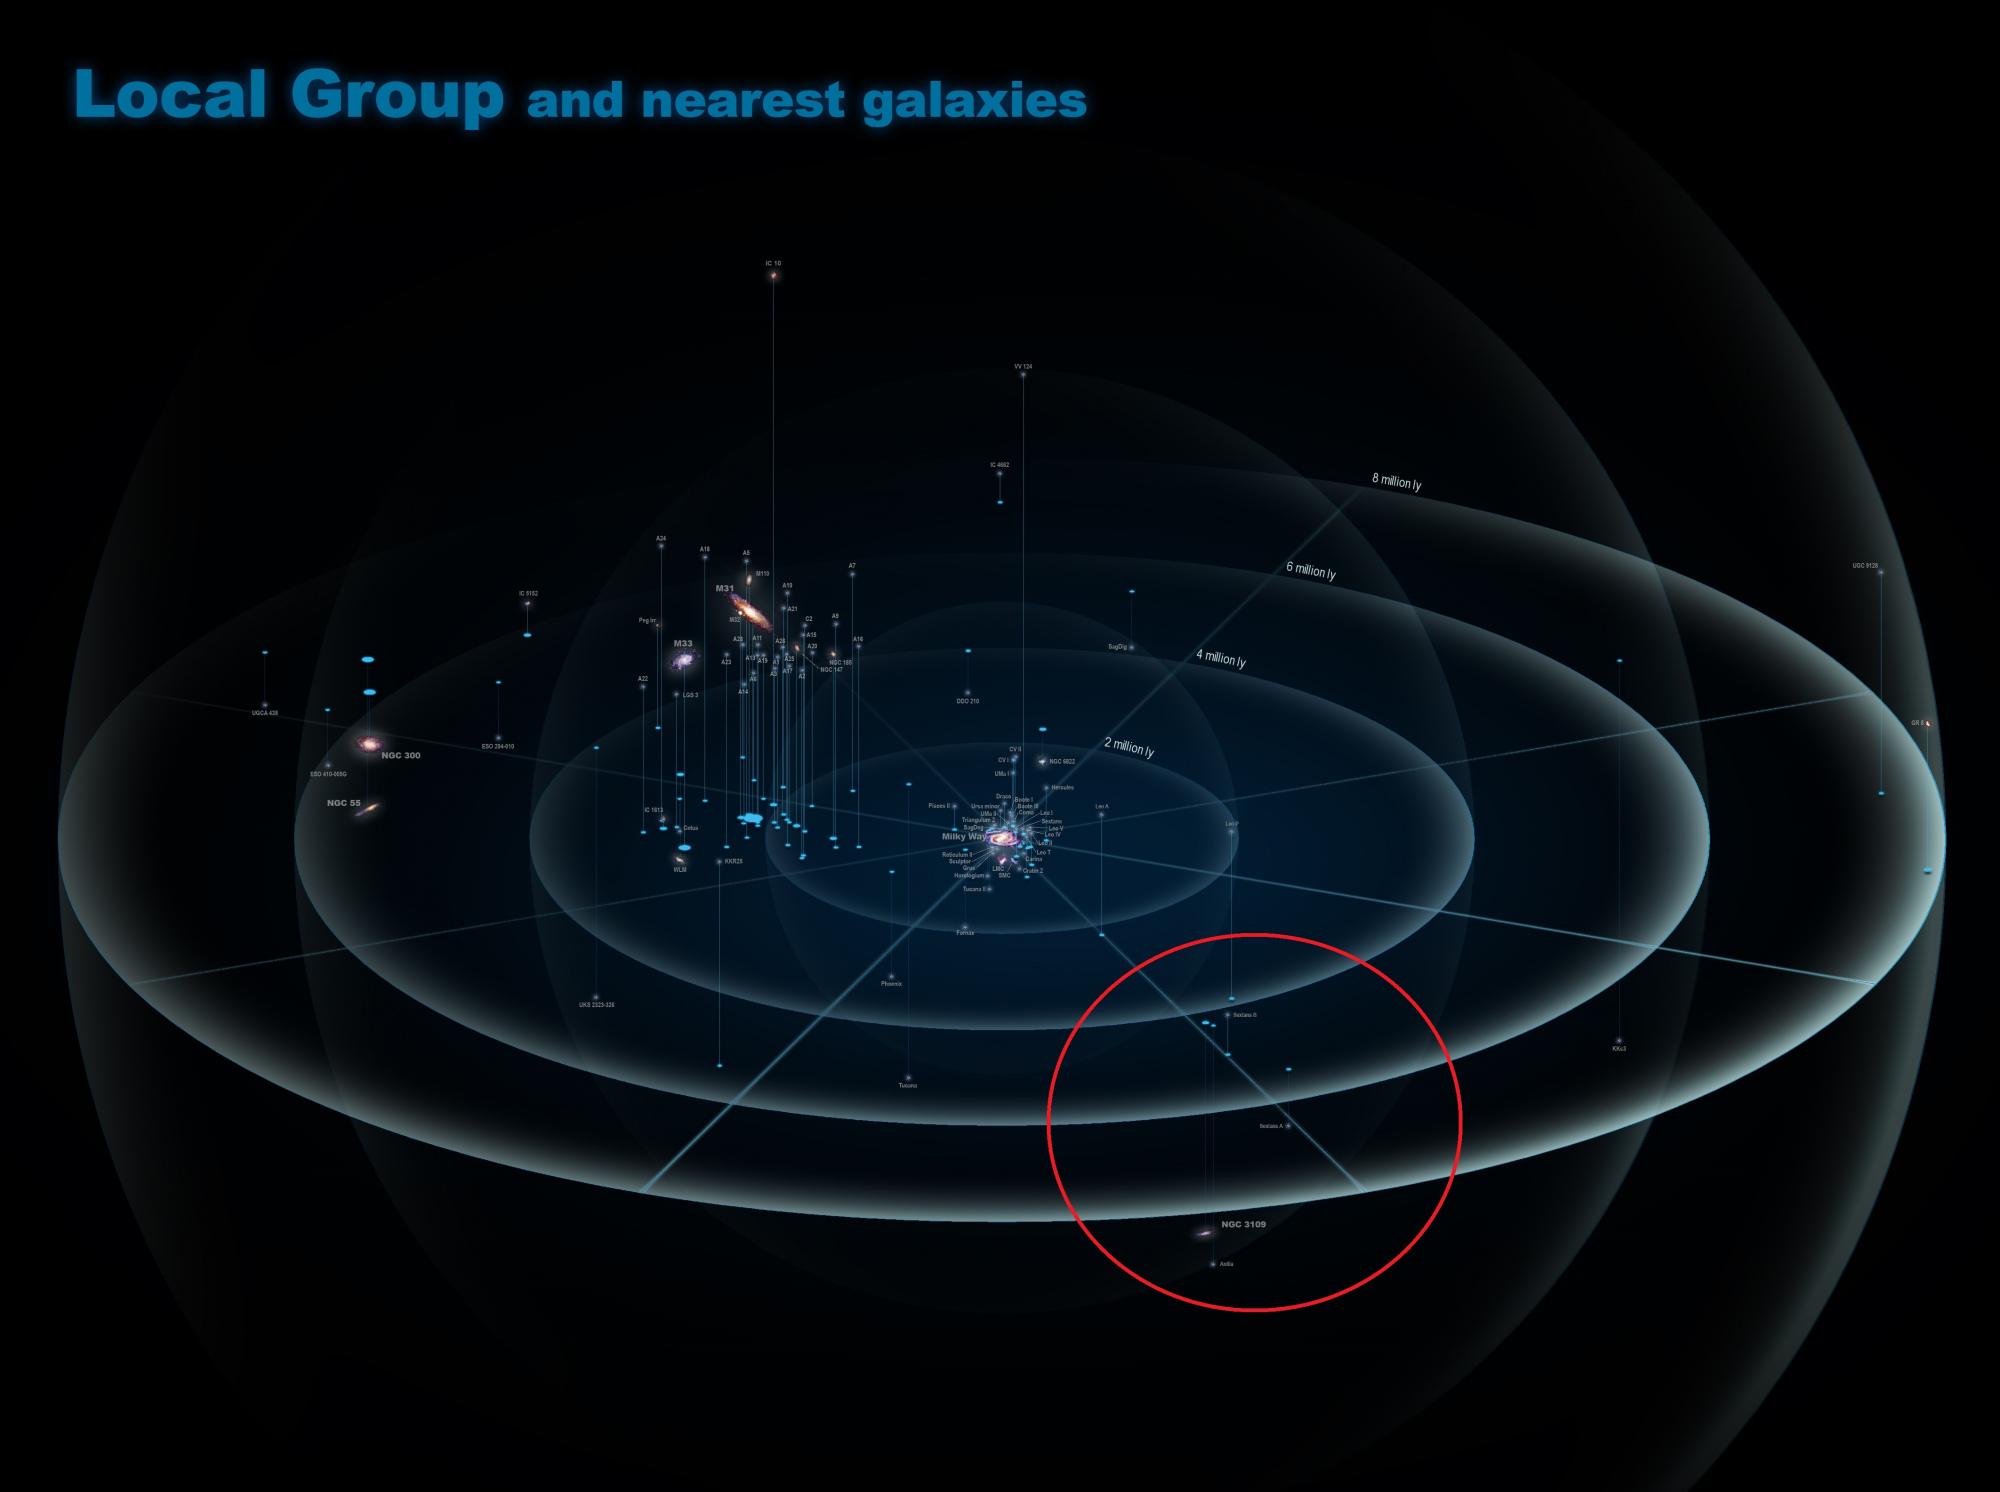 Local_Group_and_nearest_galaxies.thumb.jpg.1583b498aa467942858d8798a021d79b.jpg